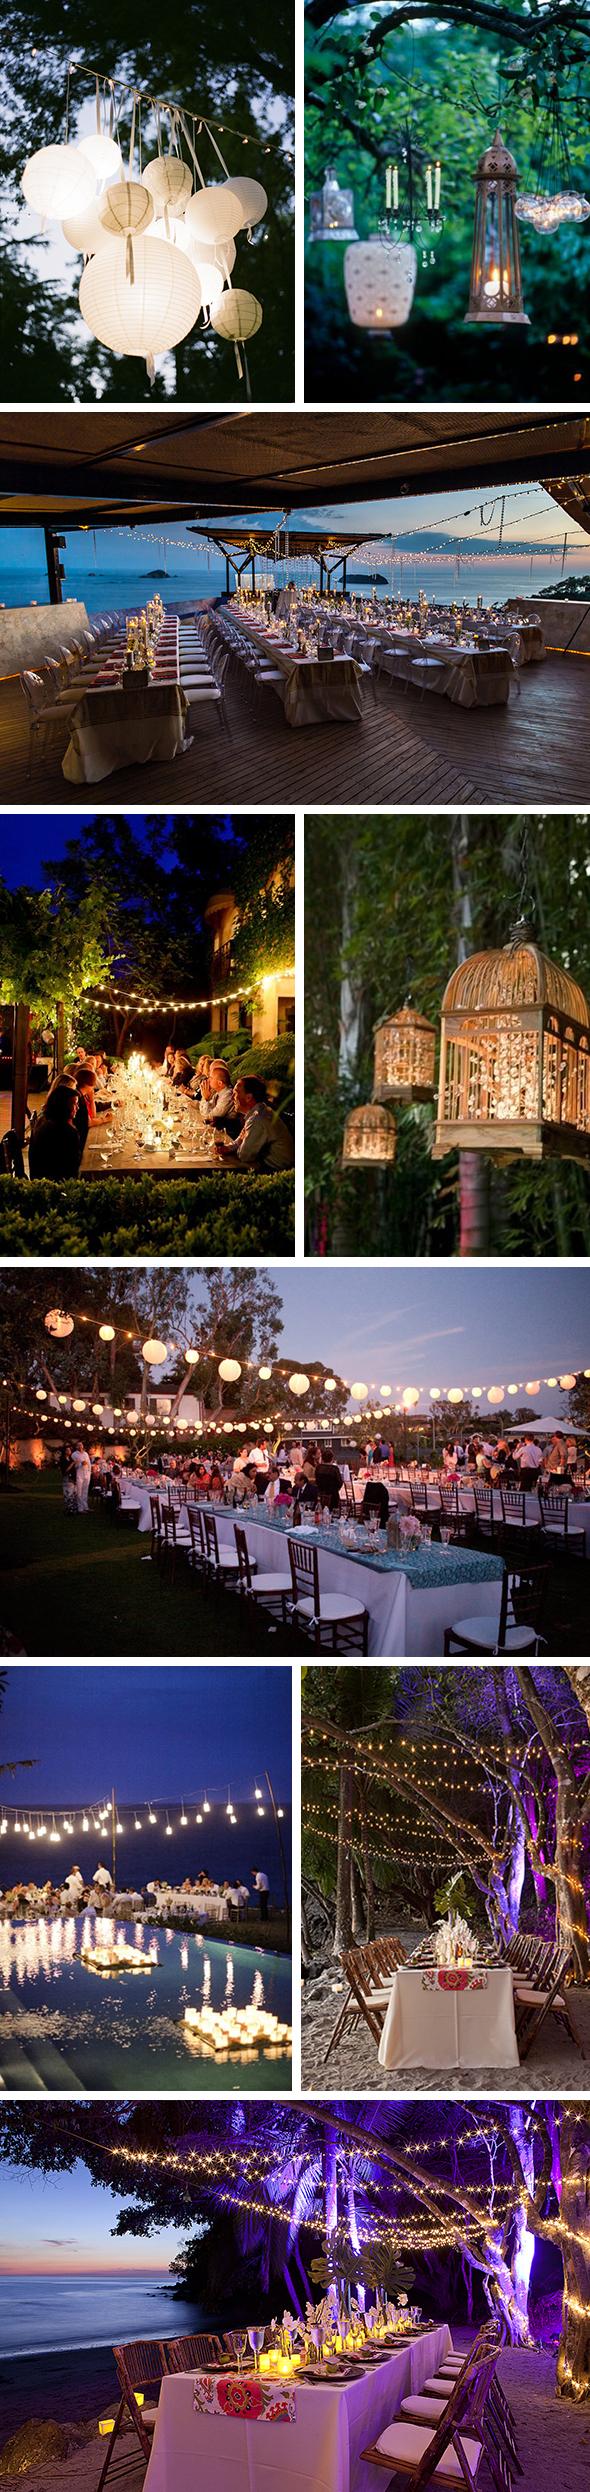 Wedding Lighting Ideas Add The Passion With Lighting Glow Sticks